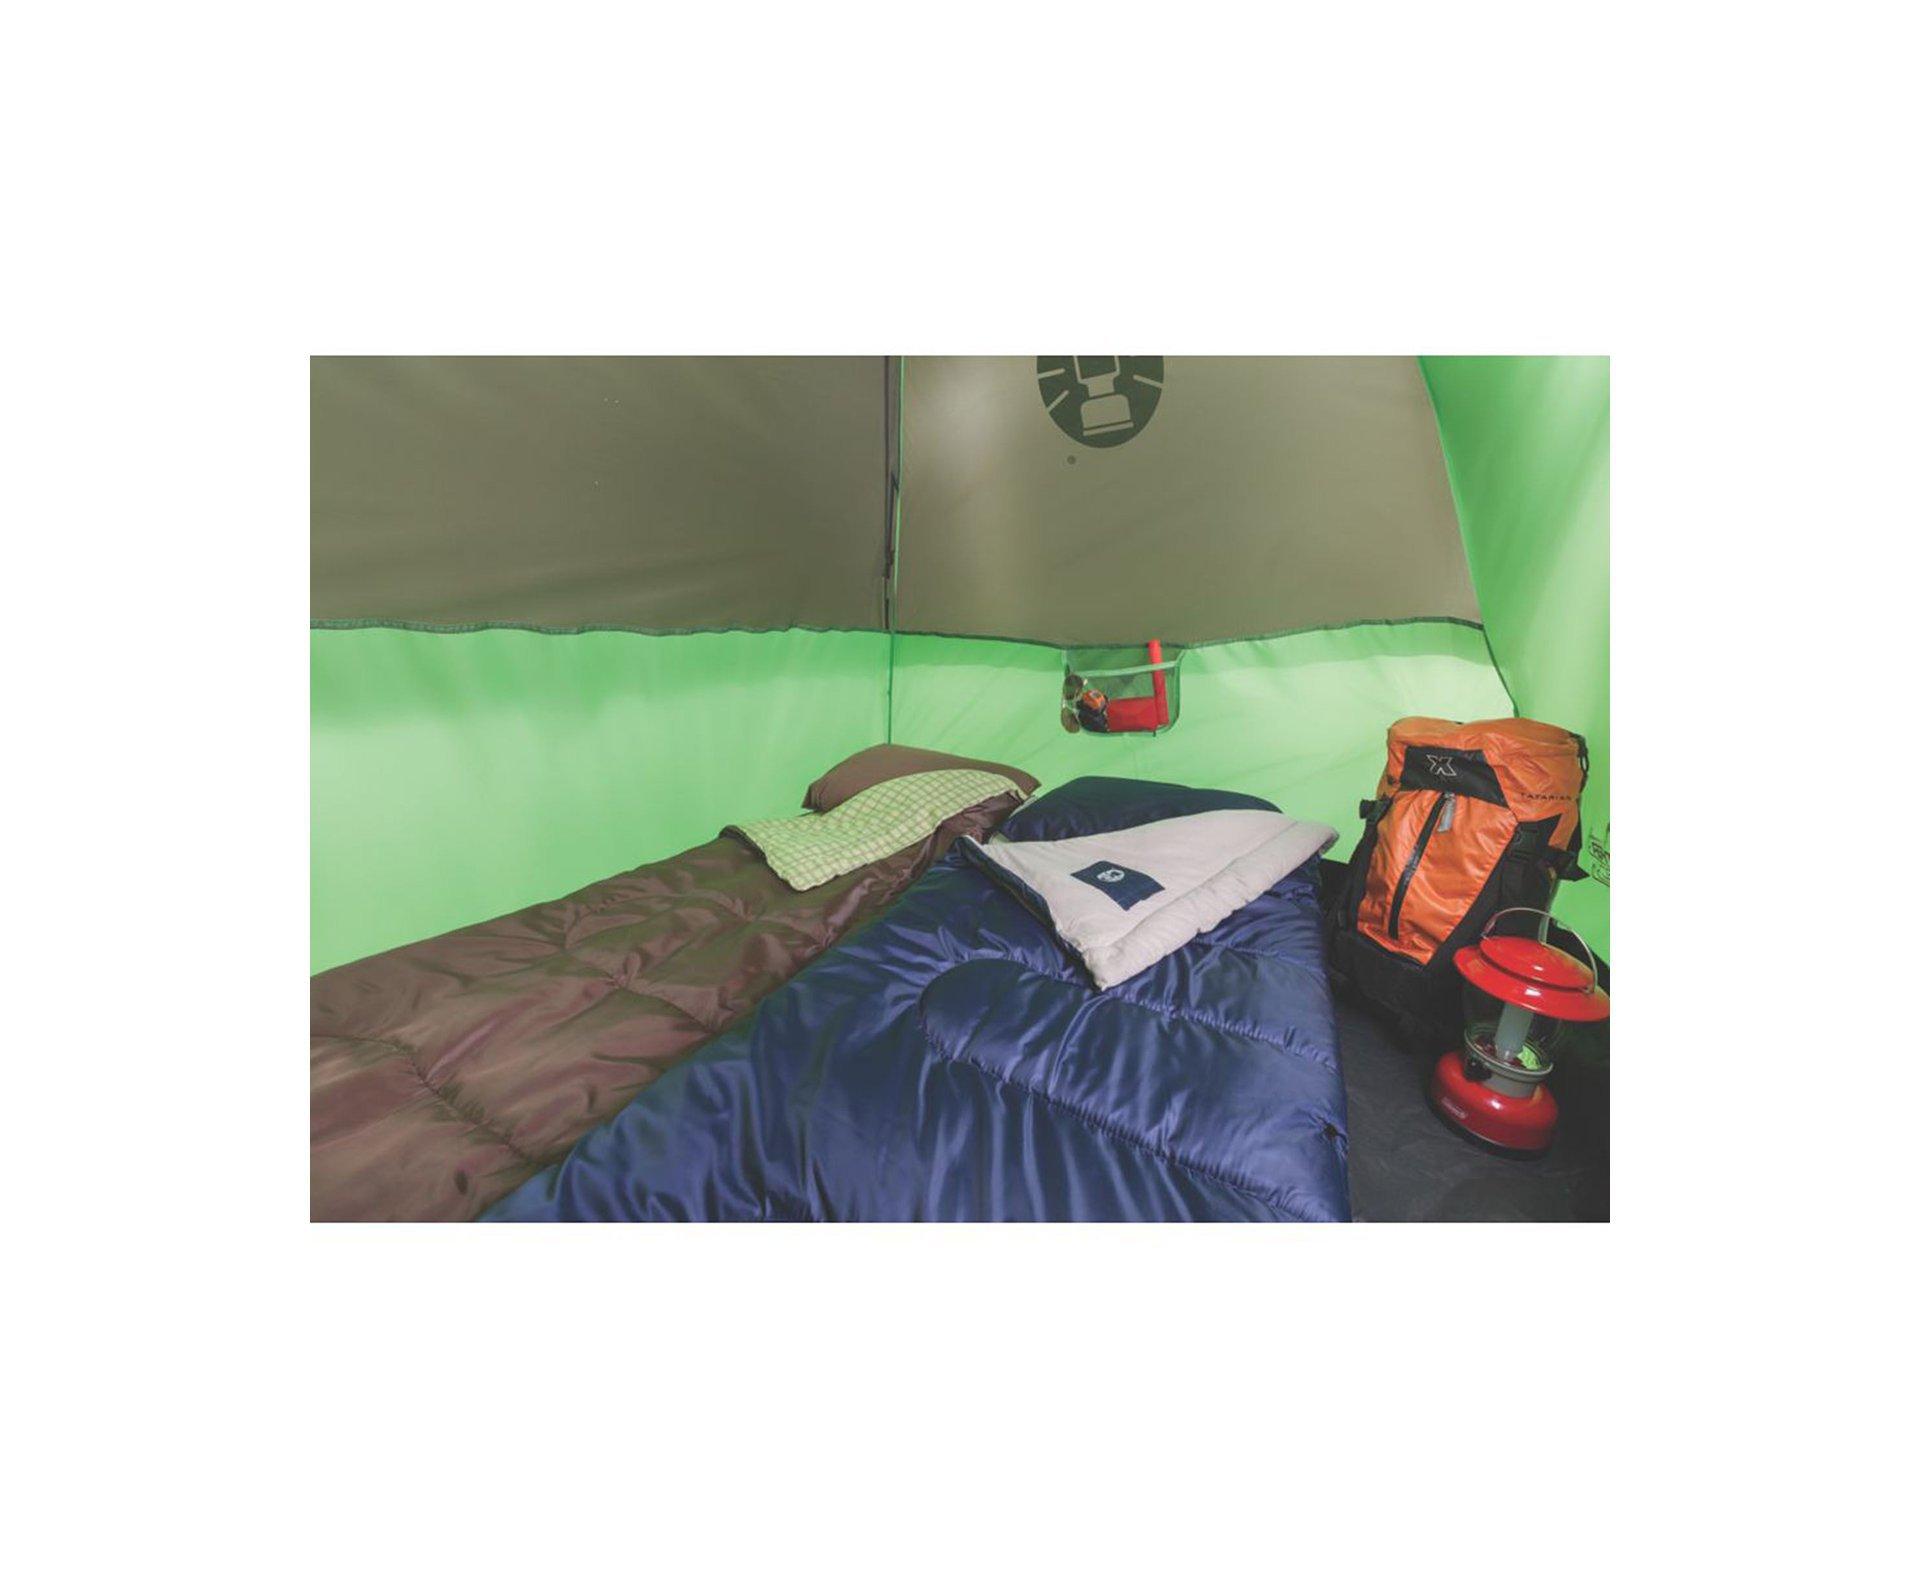 Barraca Camping Coral Reef 6 Pessoas 1800mm Coluna Dagua- Coleman